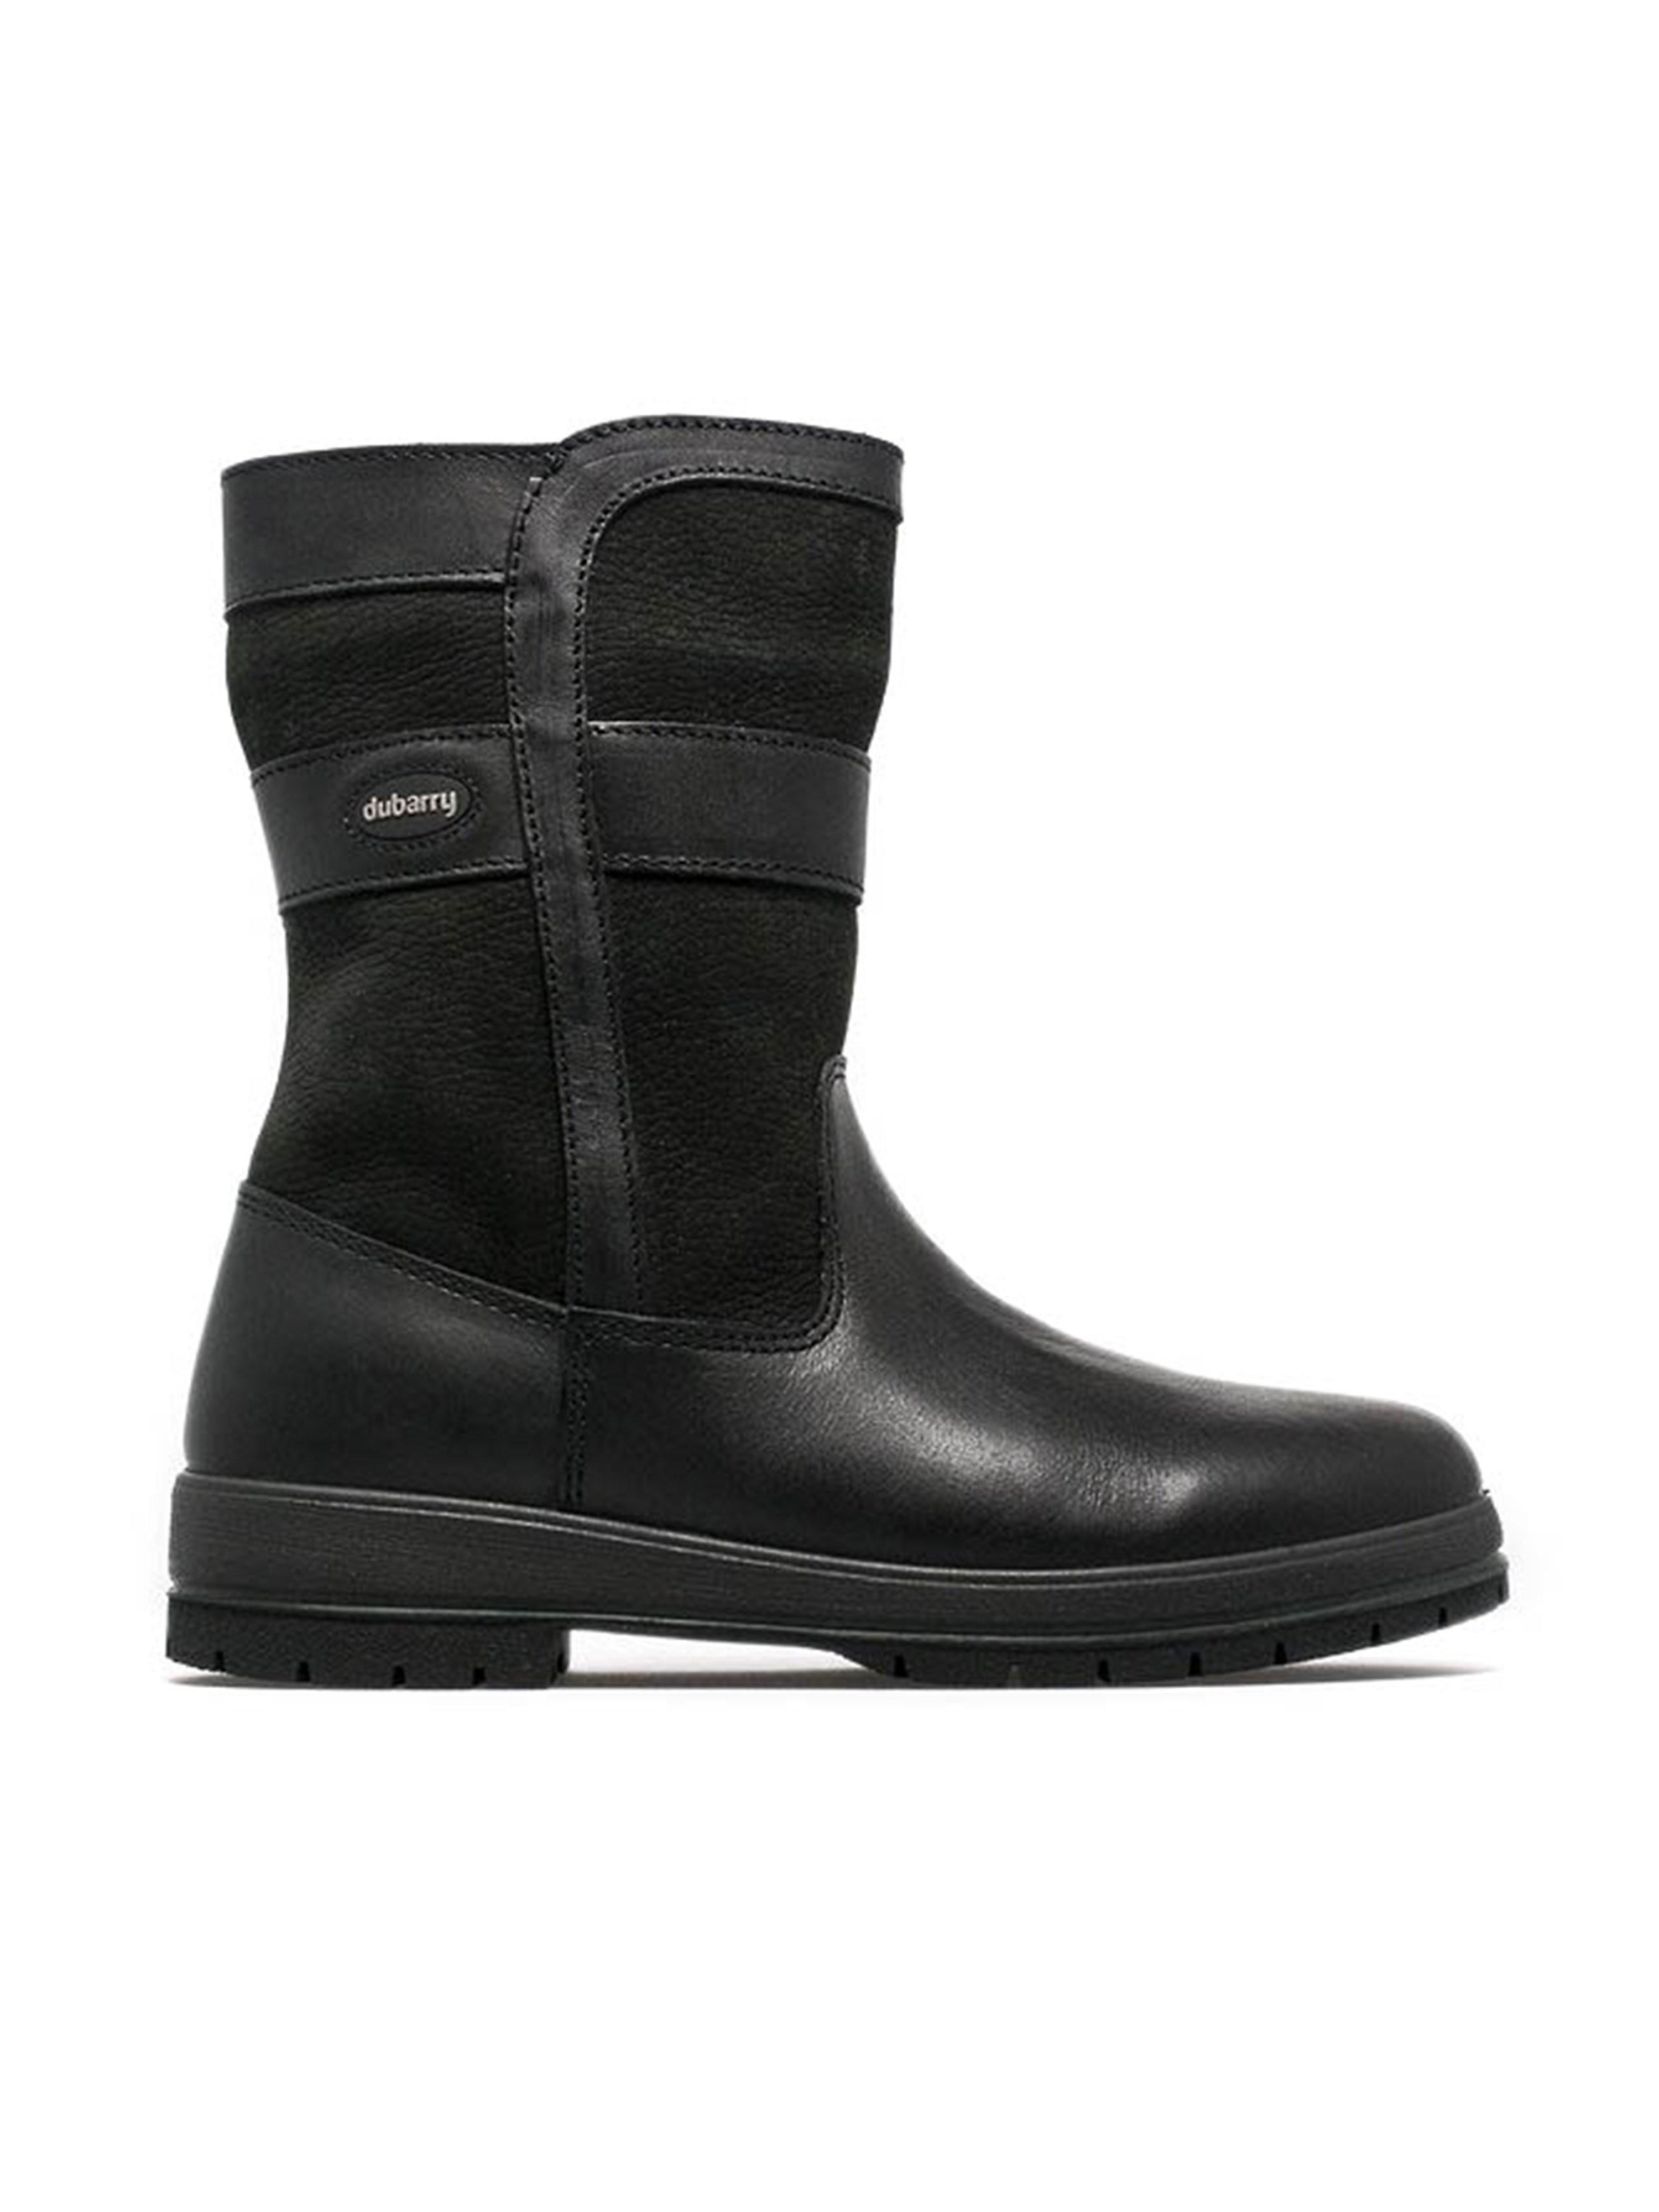 Dubarry Women's Roscommon Leather Mid Height Boots - Black